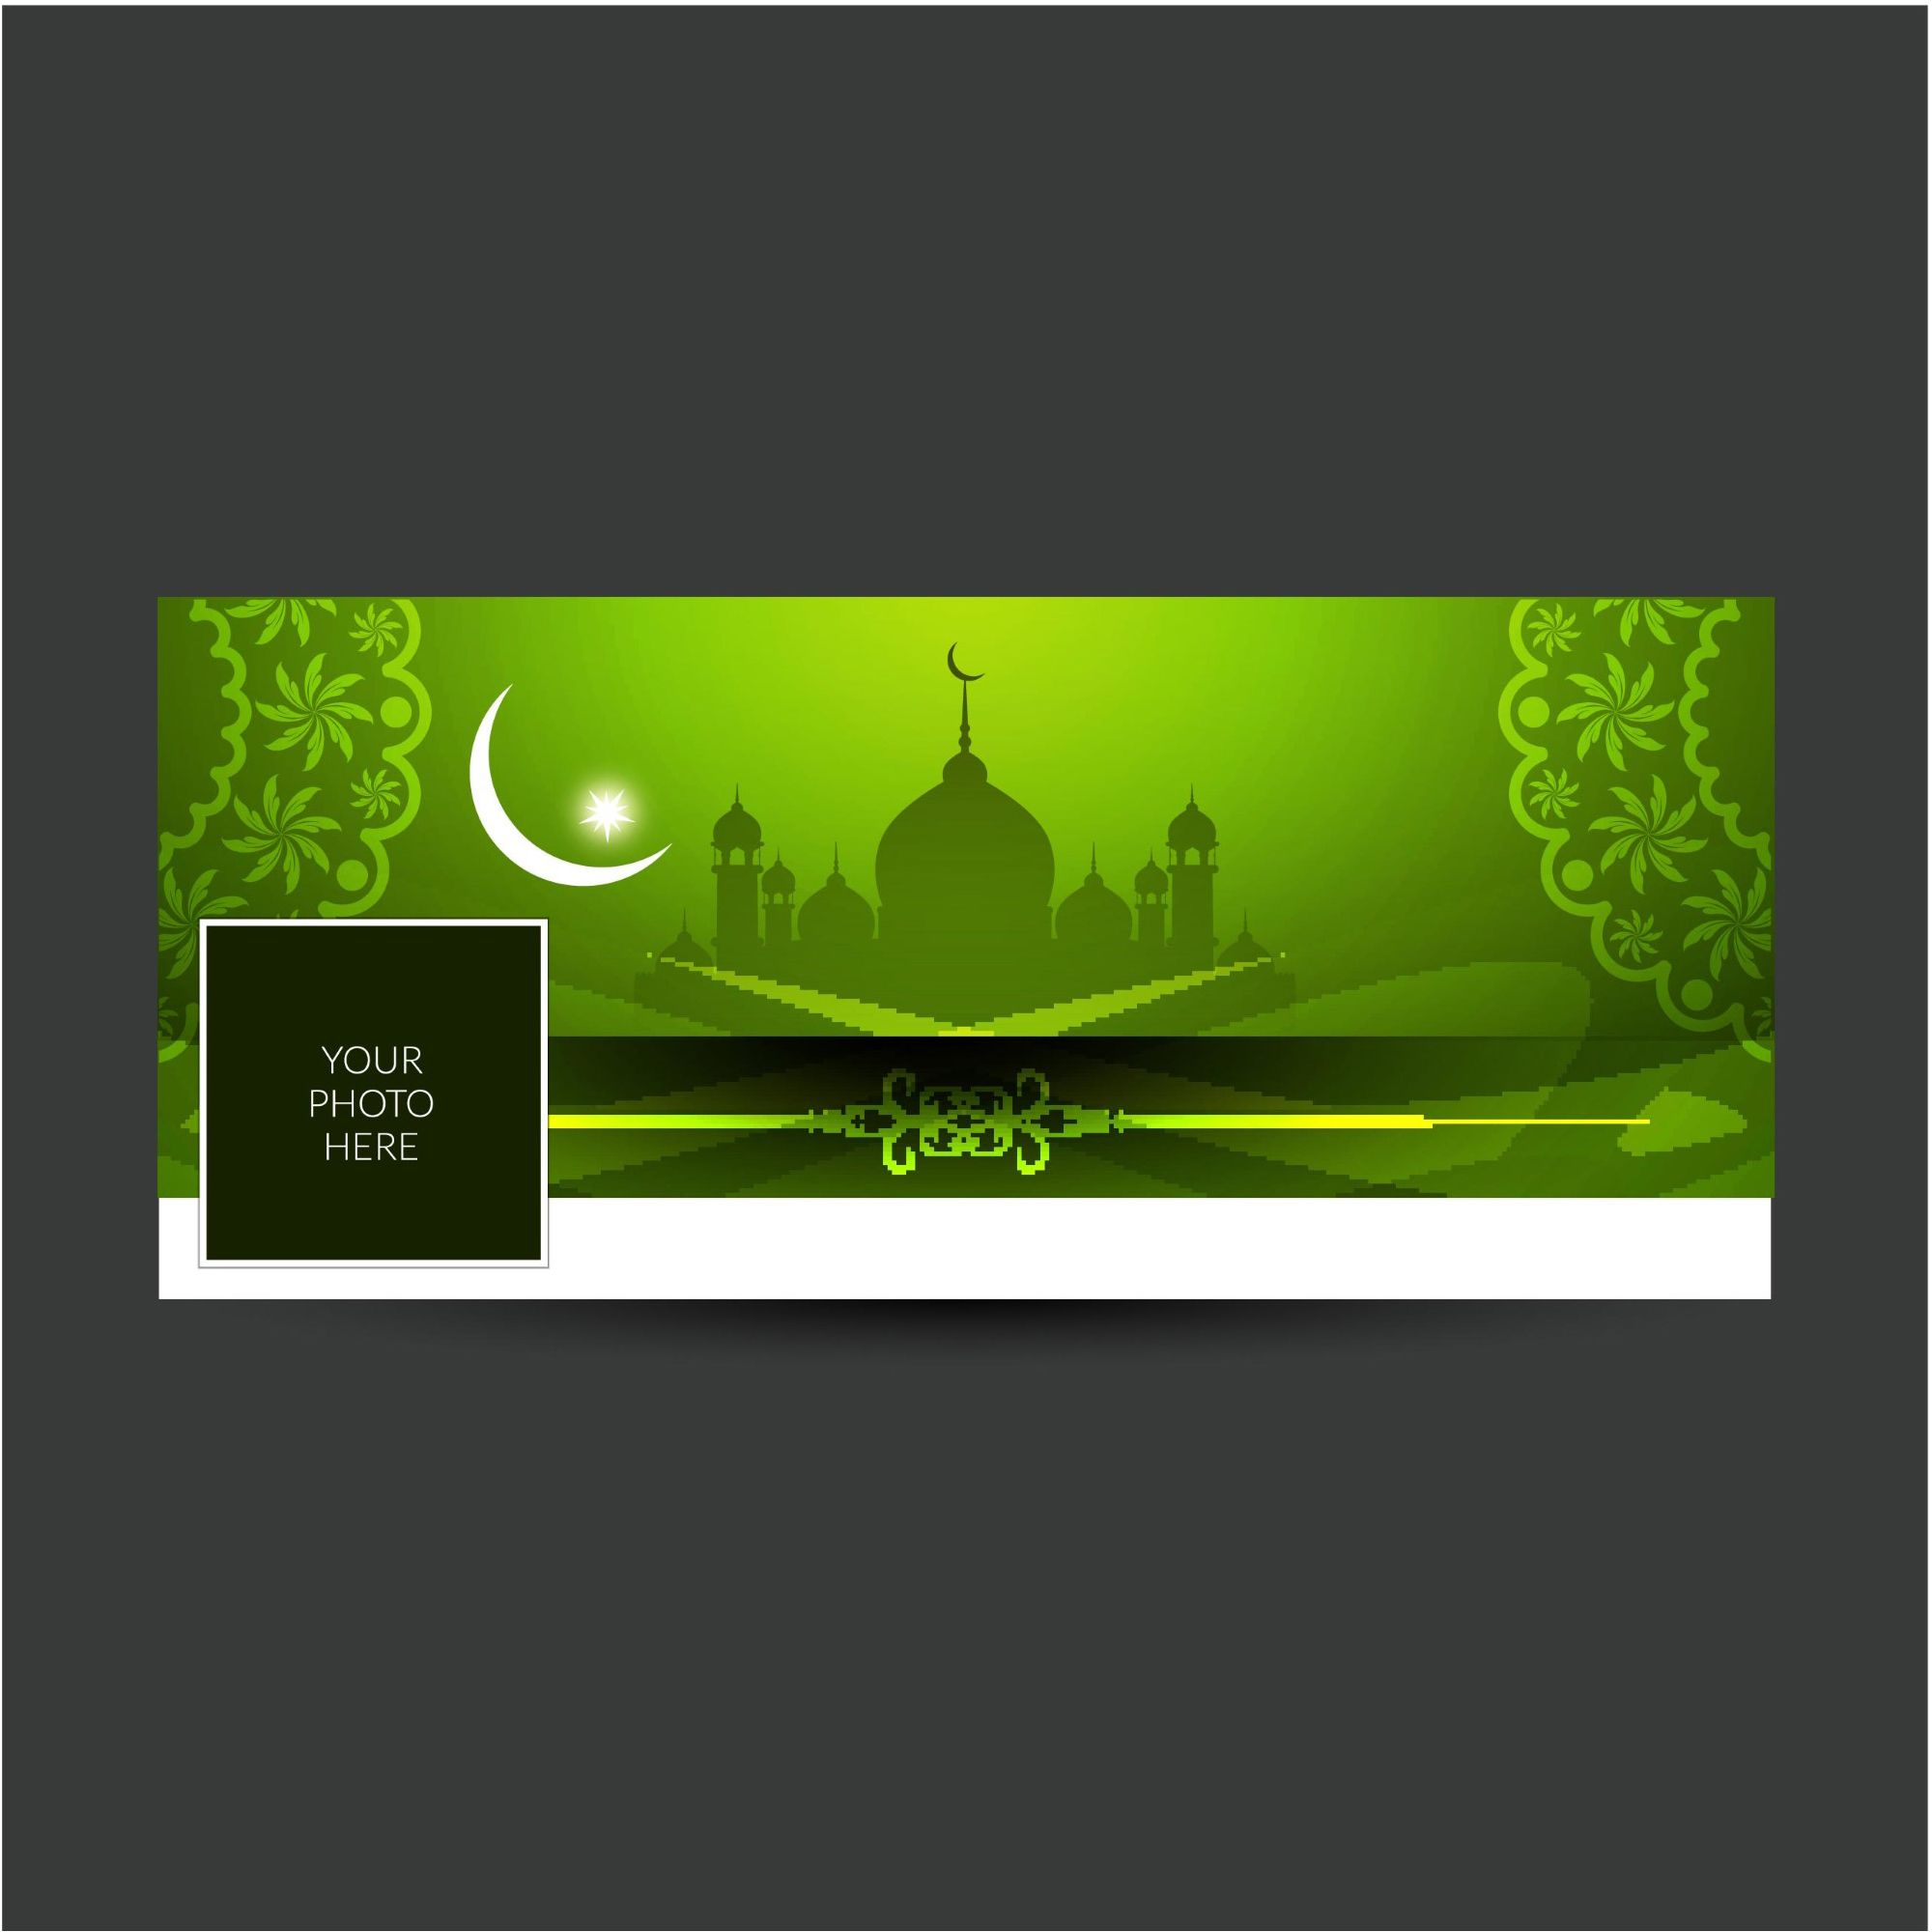 Good Facebook Cover 2016 Ied Wallpaper - 08cddb24af932b37169da1b0cff7b825  HD_966056 .jpg